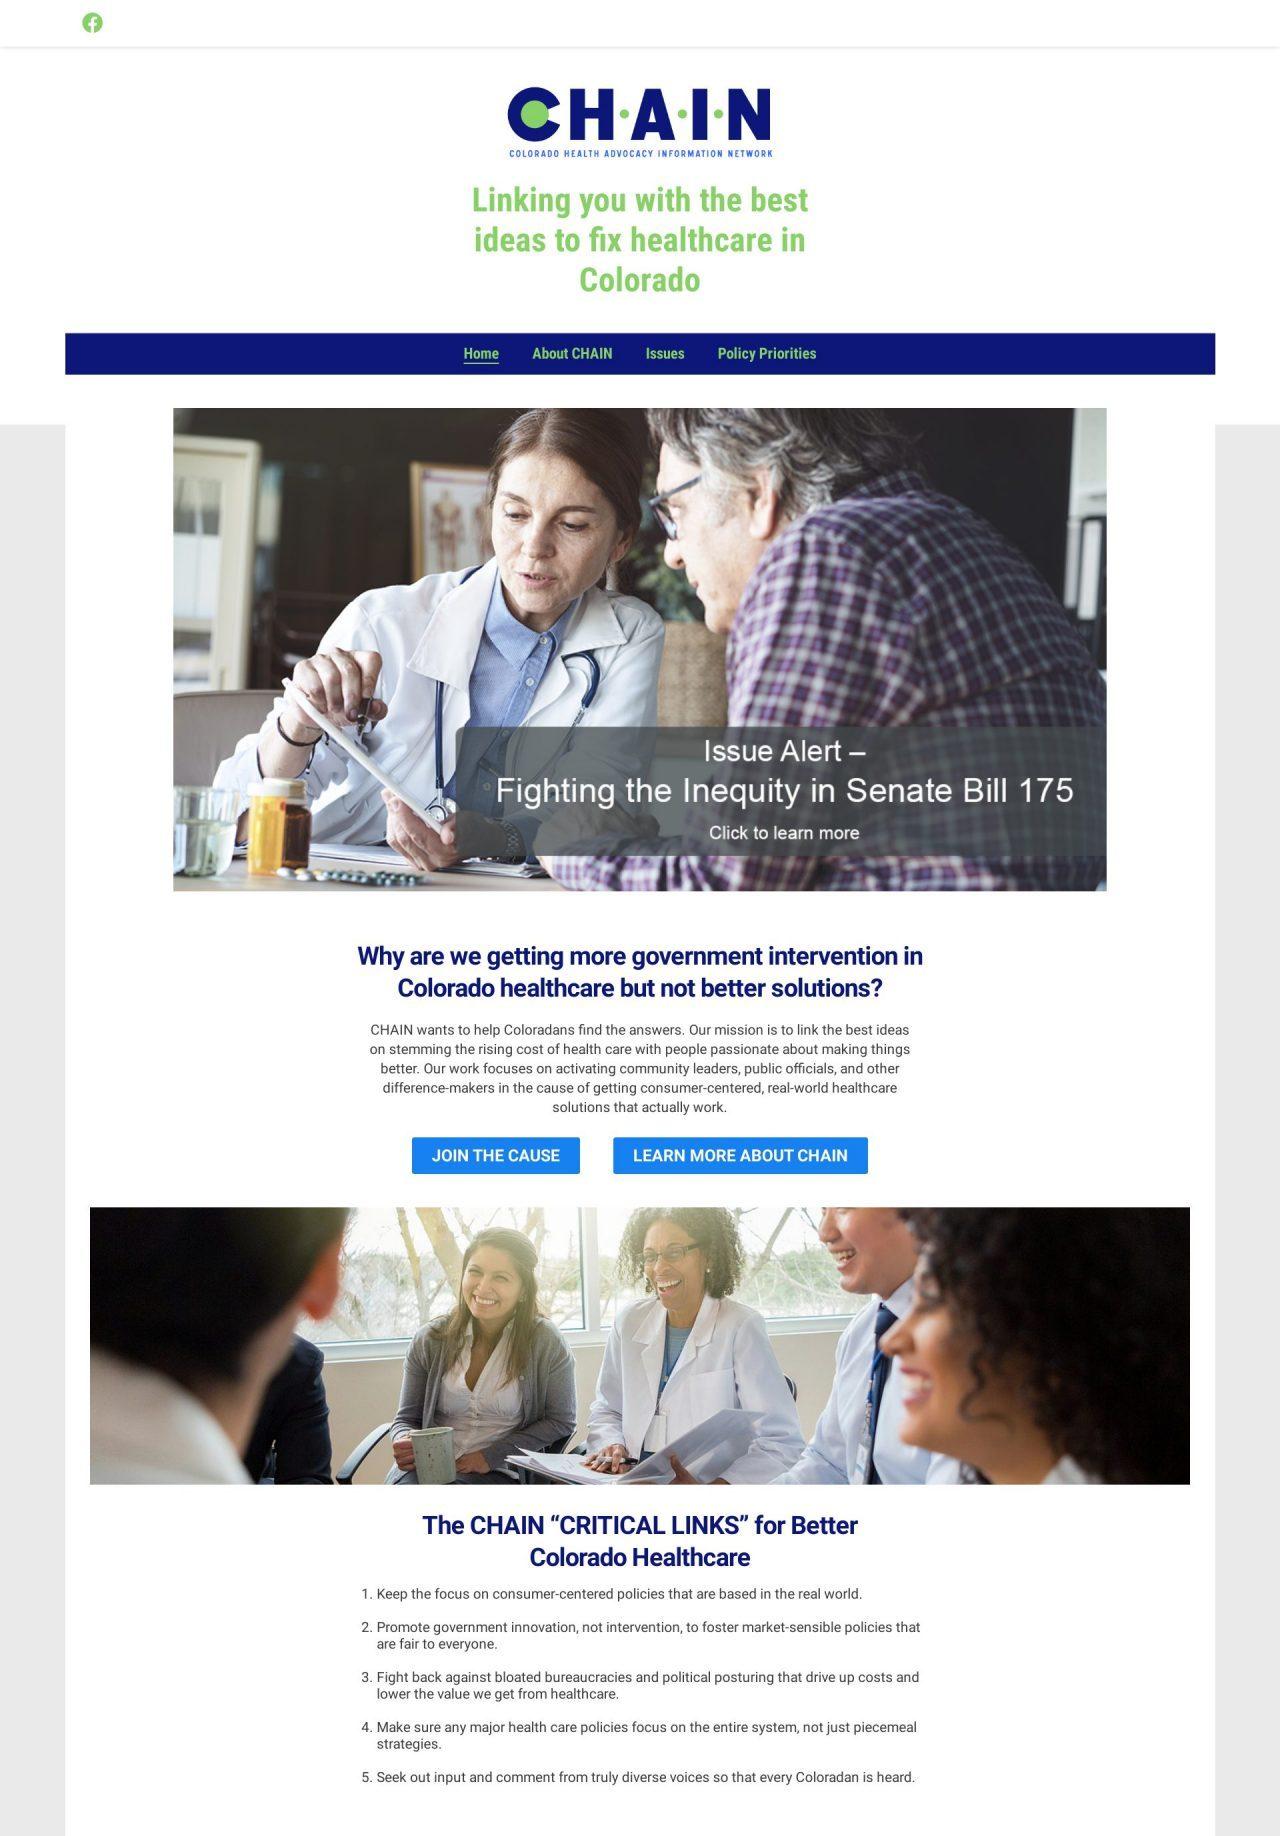 Colorado Health Advocacy Info. Network